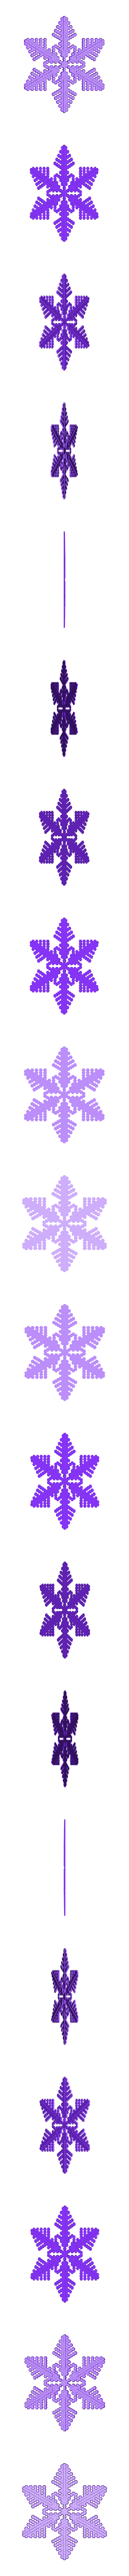 reiter30-3d.stl Download free STL file Snowflake growth simulation in BlocksCAD • 3D printing design, arpruss